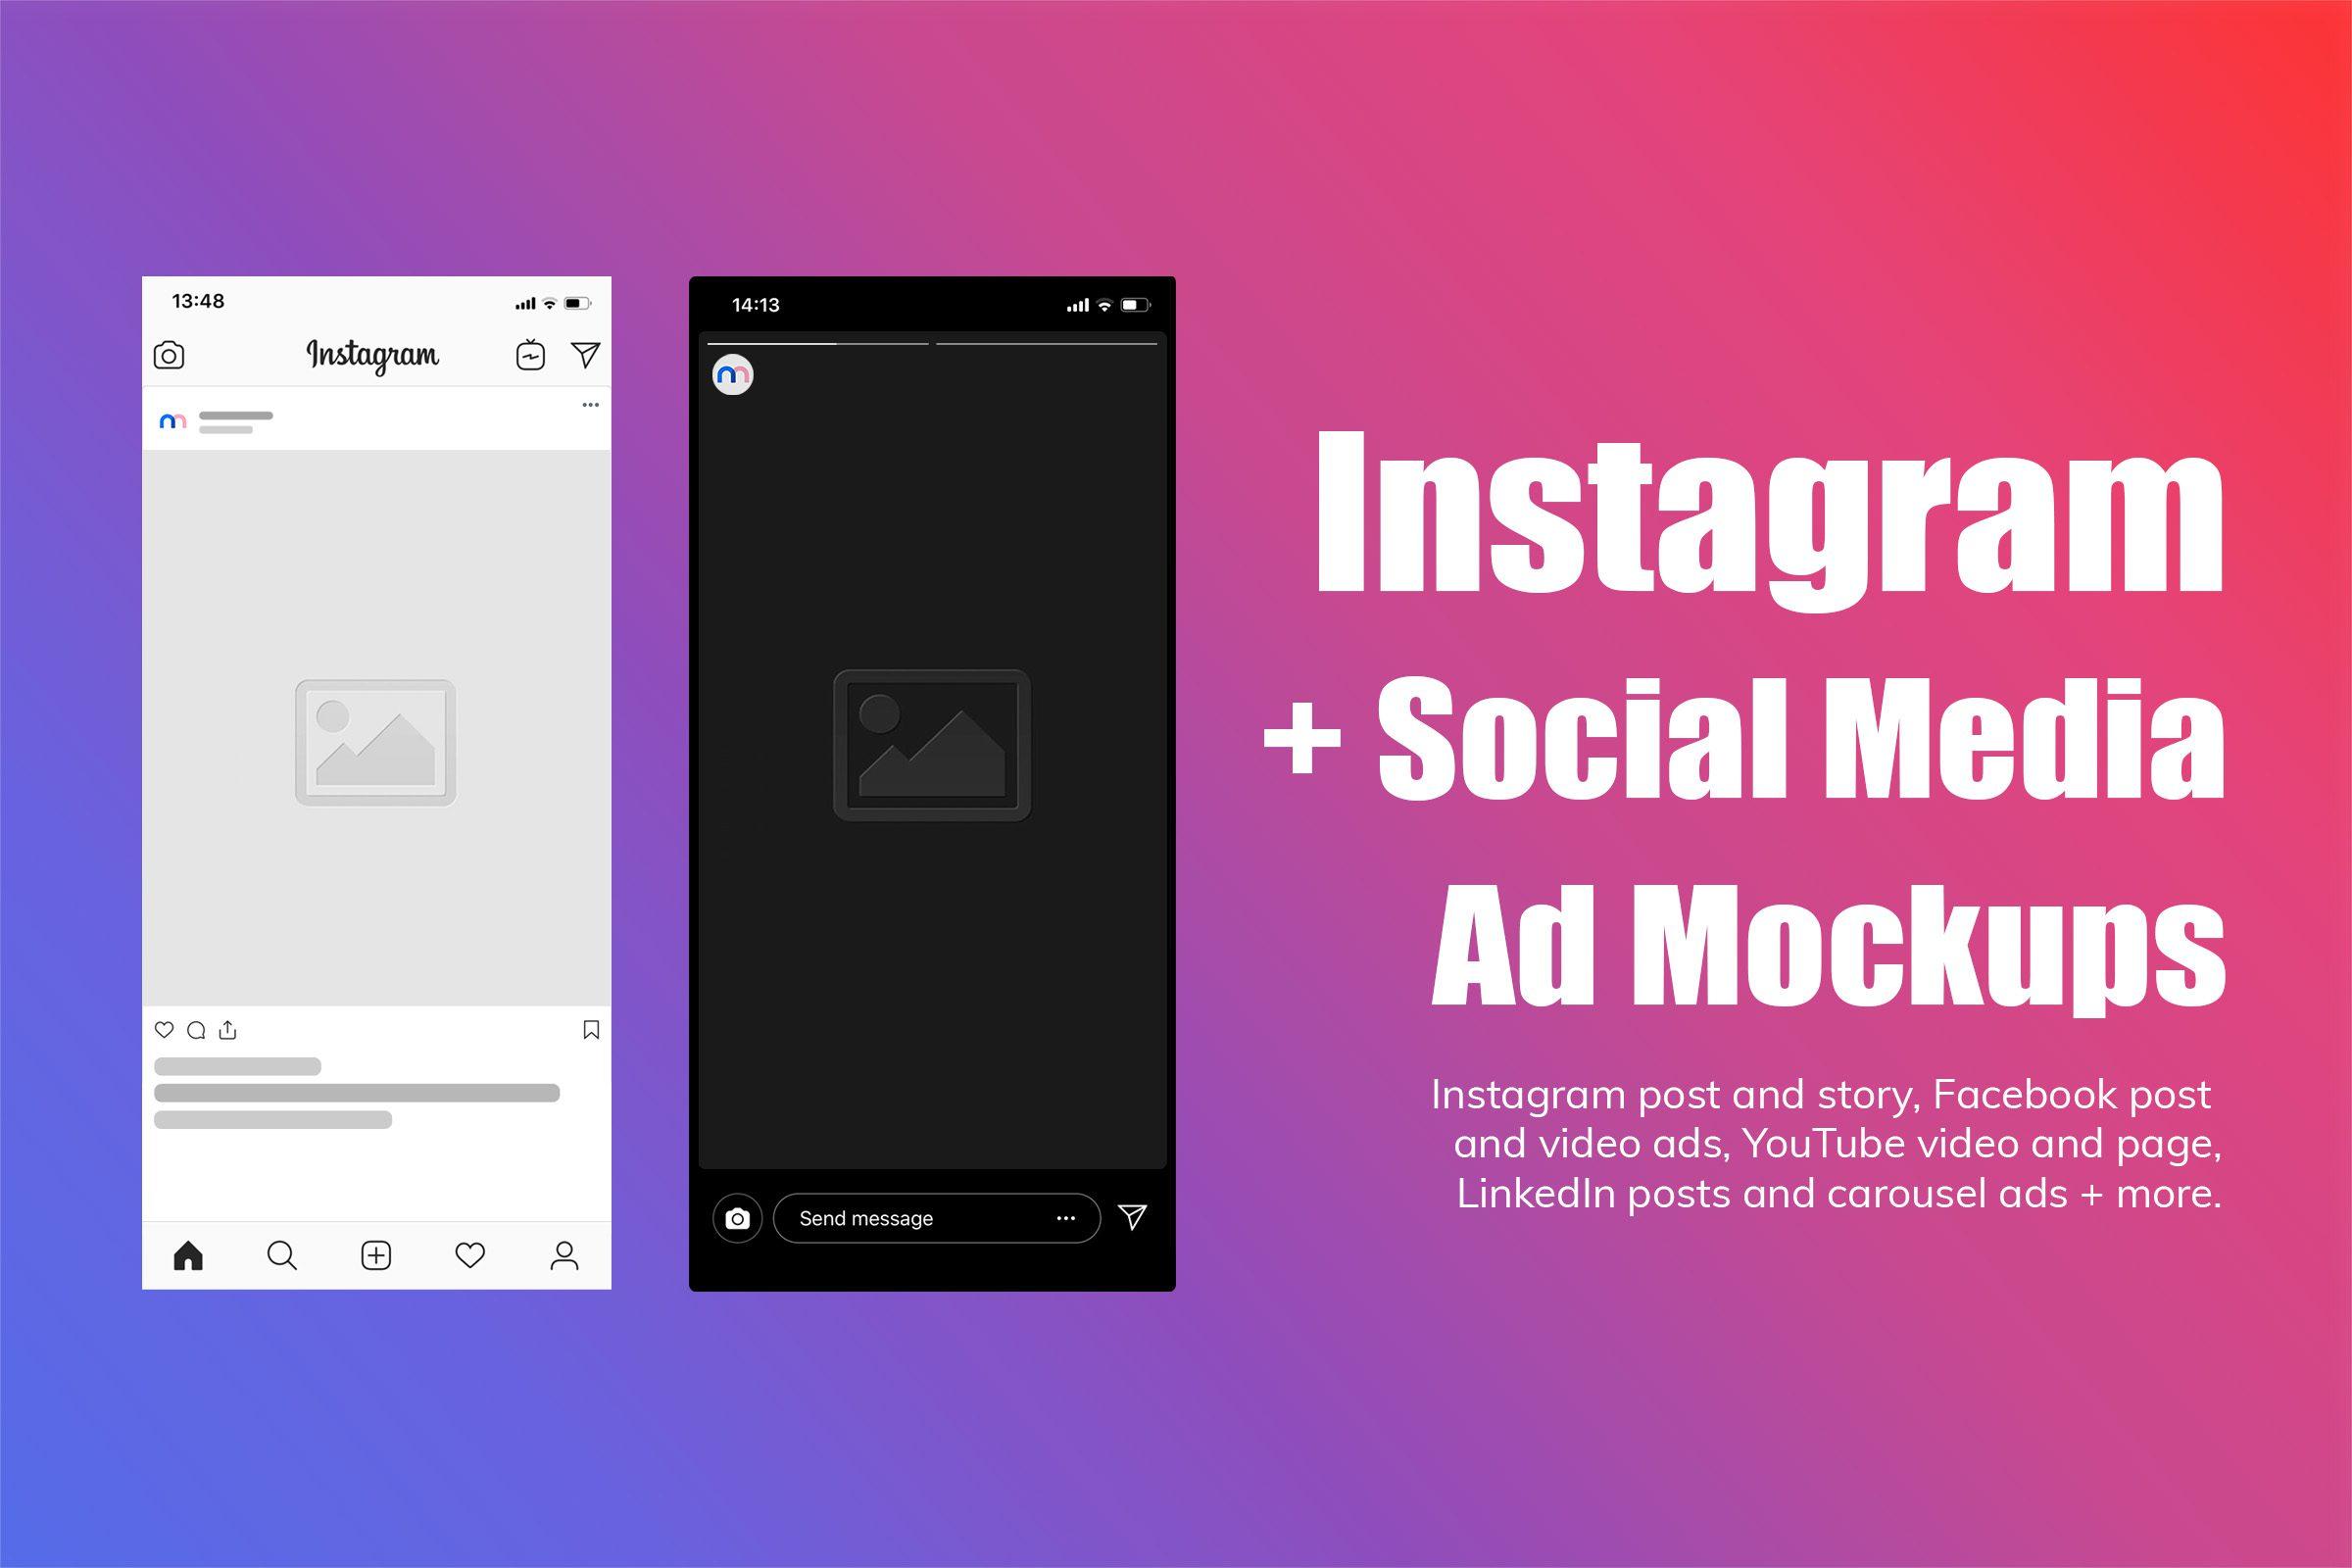 10 best linkedin mockups   mediamodifier. 31 Best Instagram And Social Media Mockups For 2021 Mediamodifier